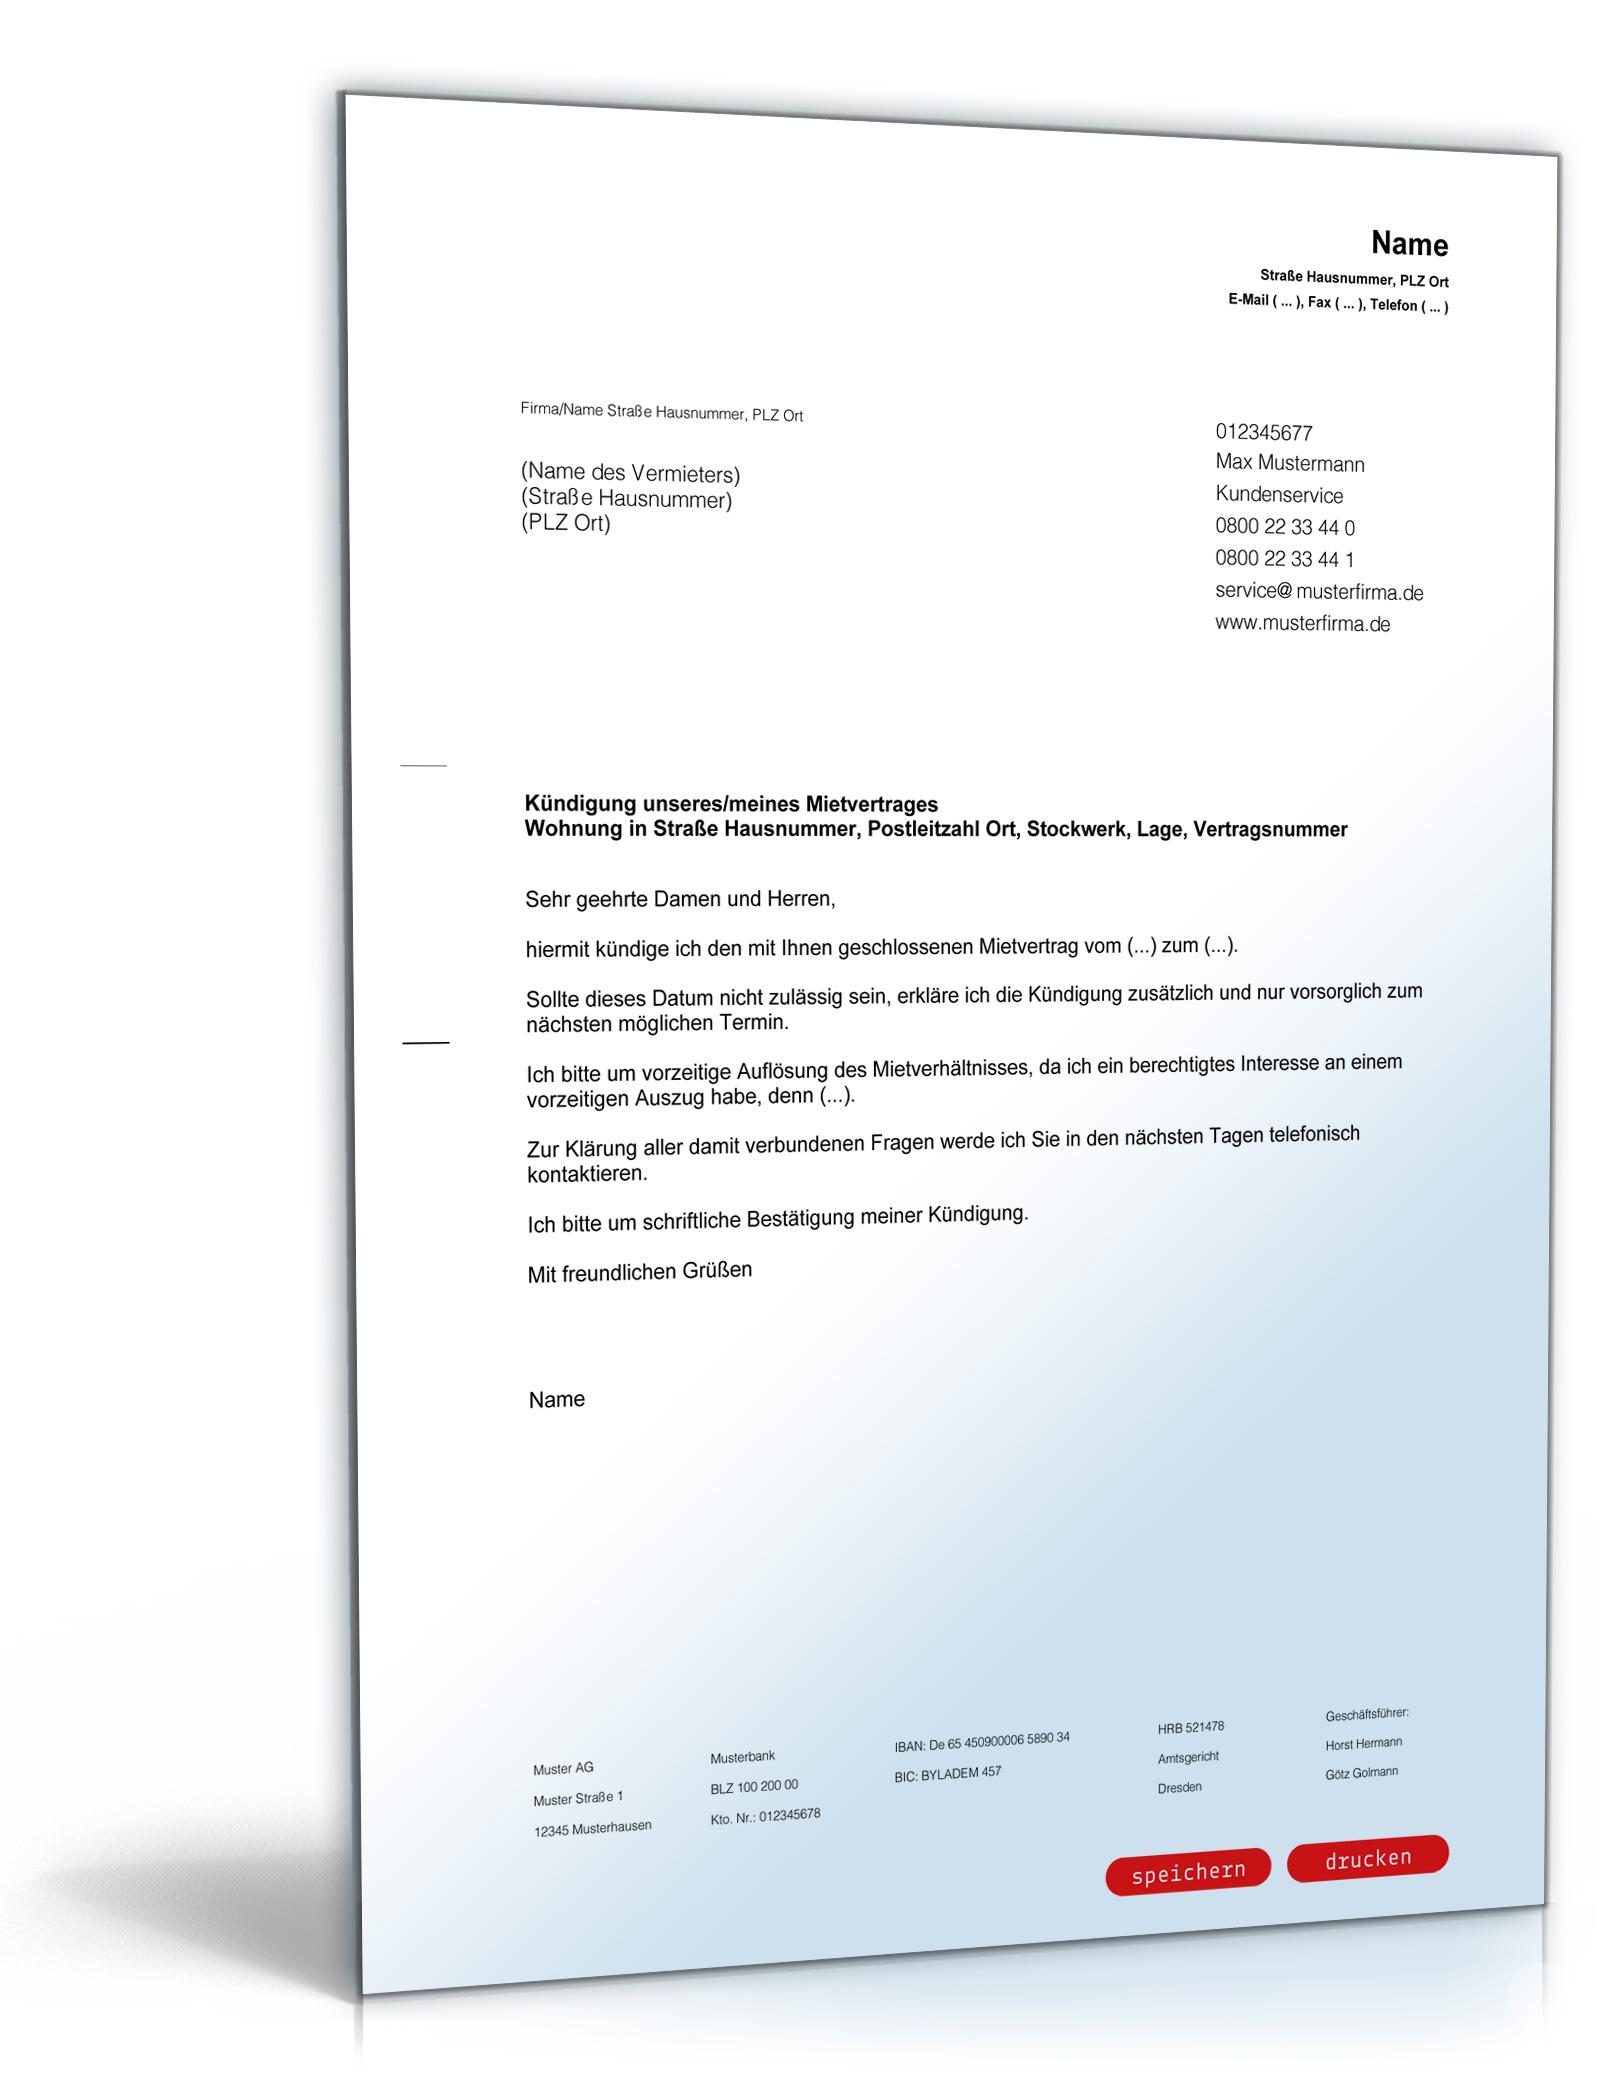 Kündigung Mietvertrag durch Mieter [PDF Download]